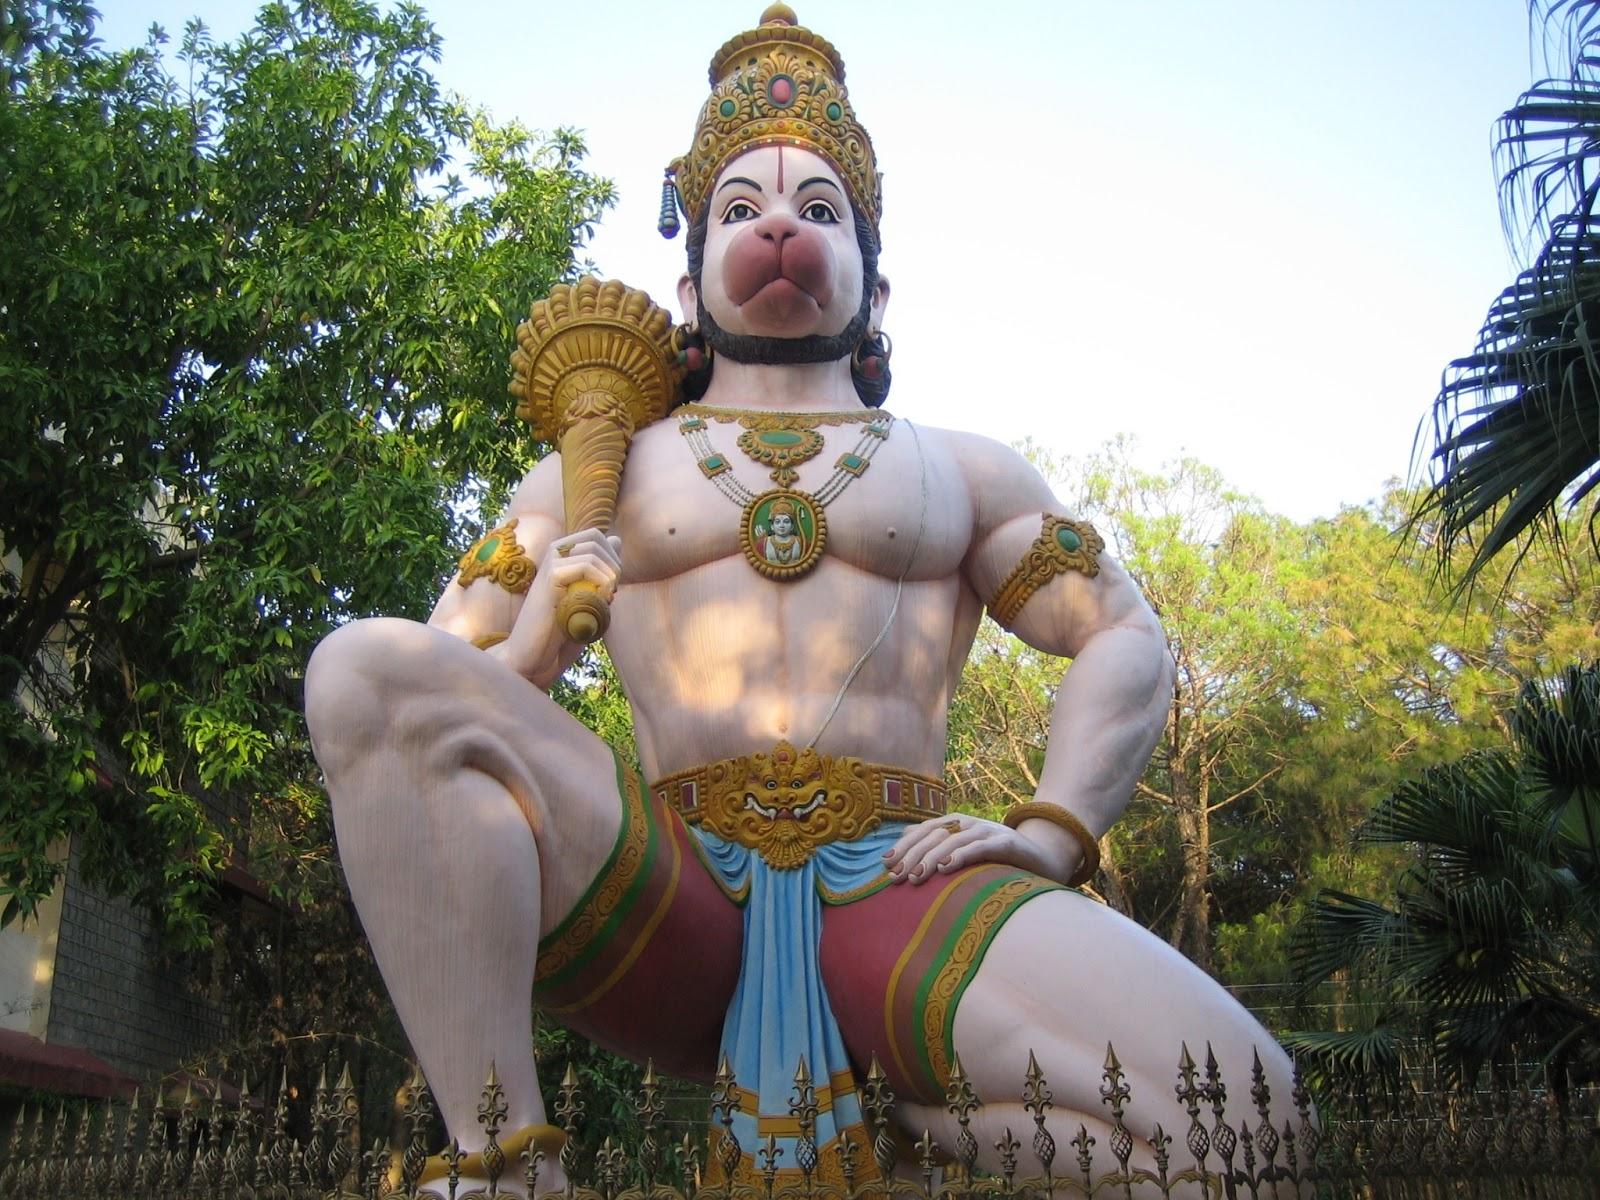 HD Wallpapers Fine: load hanuman,god balaji,bajrang bali best size hd ...